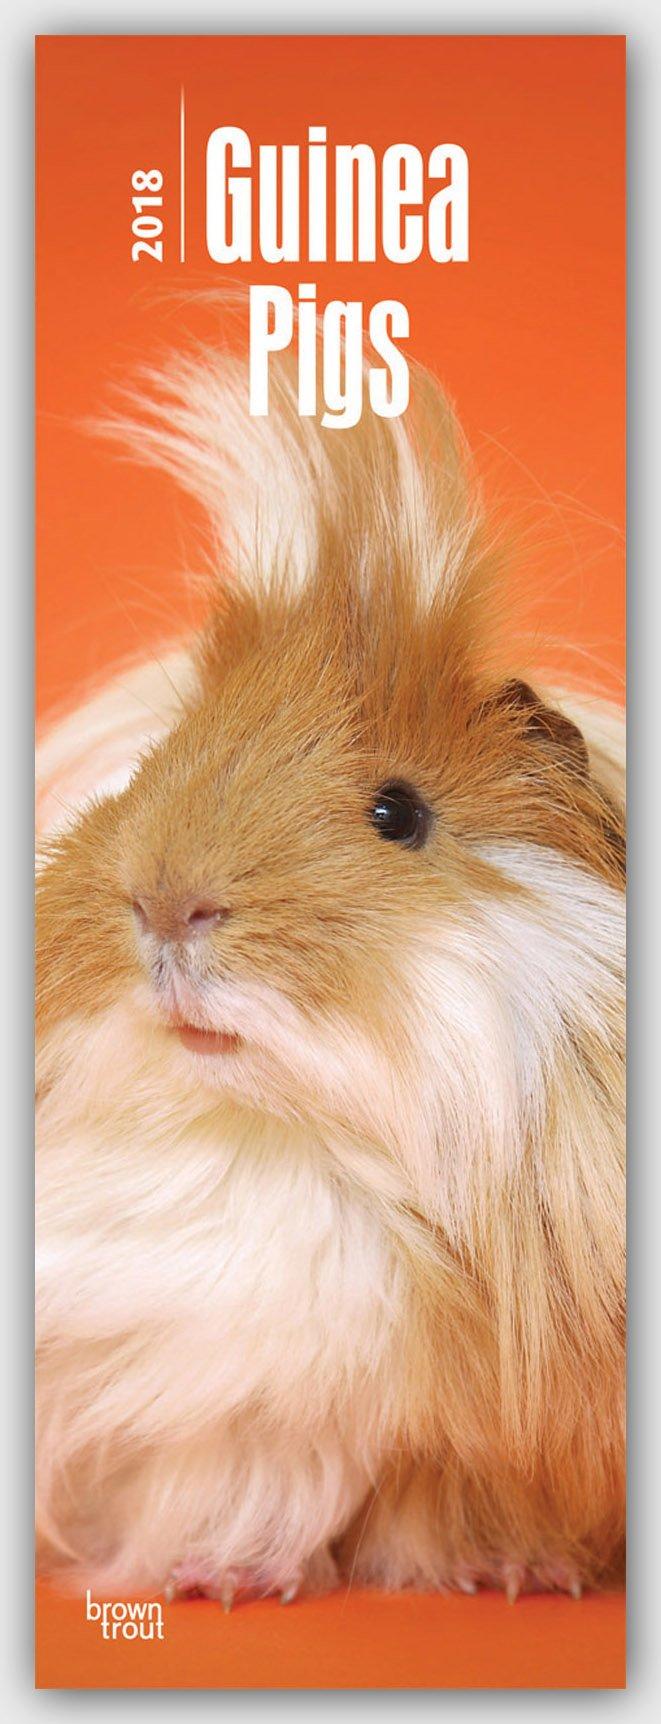 Guinea Pigs – Meerschweinchen 2018: Original BrownTrout-Kalender - Slimeline [Mehrsprachig] [Kalender] (Slimline-Kalender)